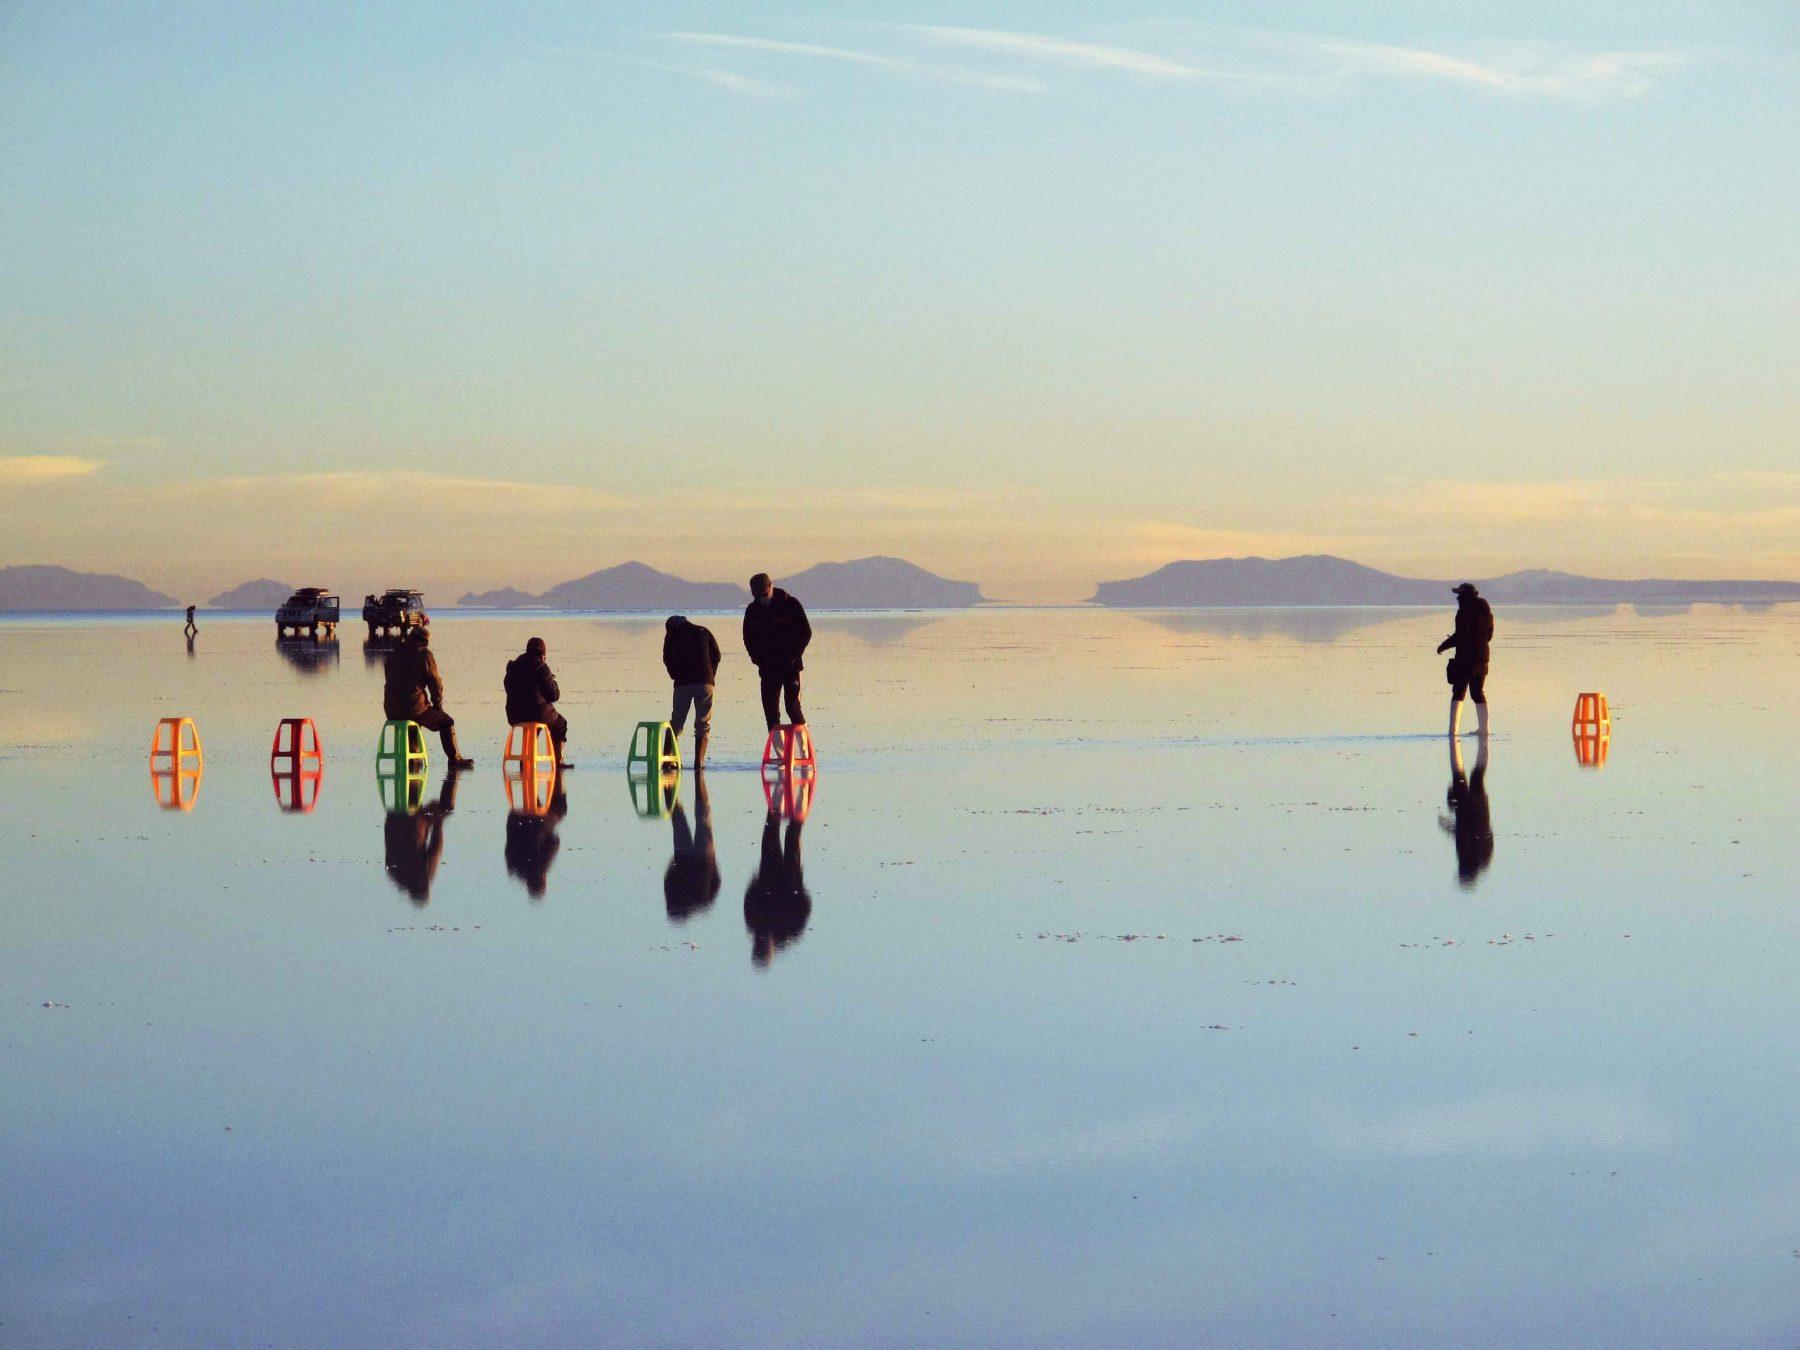 le désert d'Uyuni, Bolivie